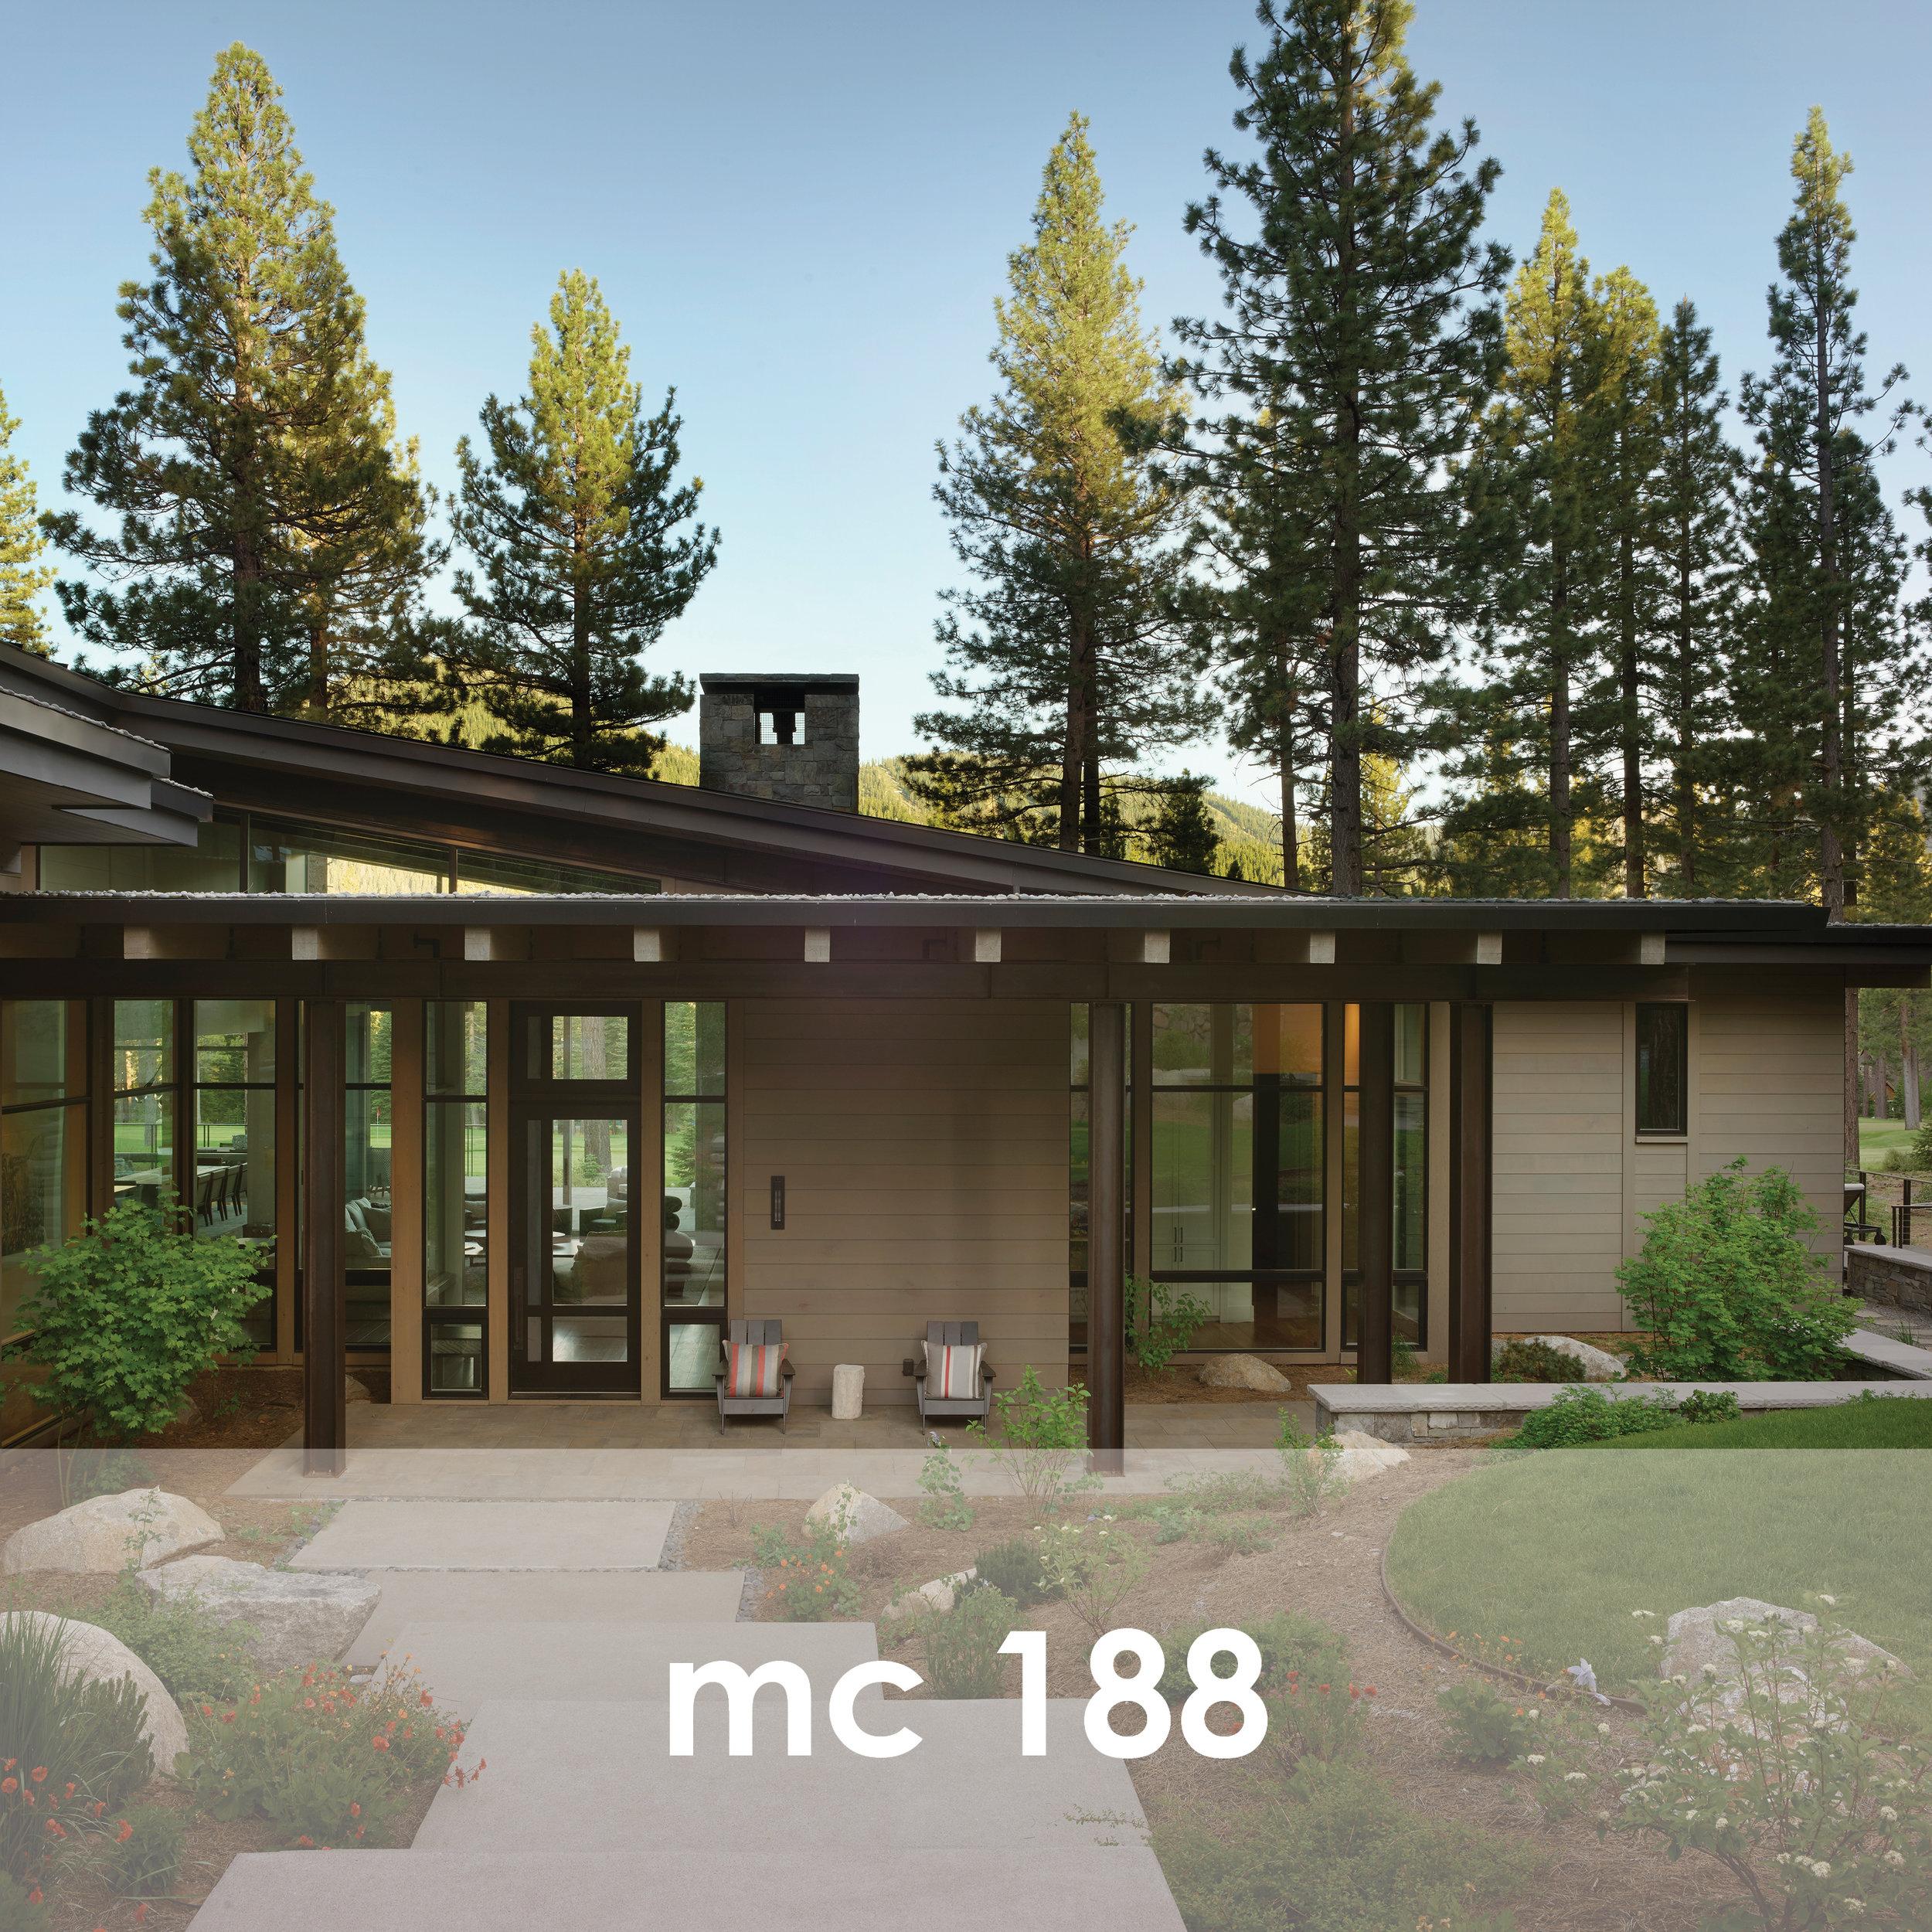 mc-188.jpg